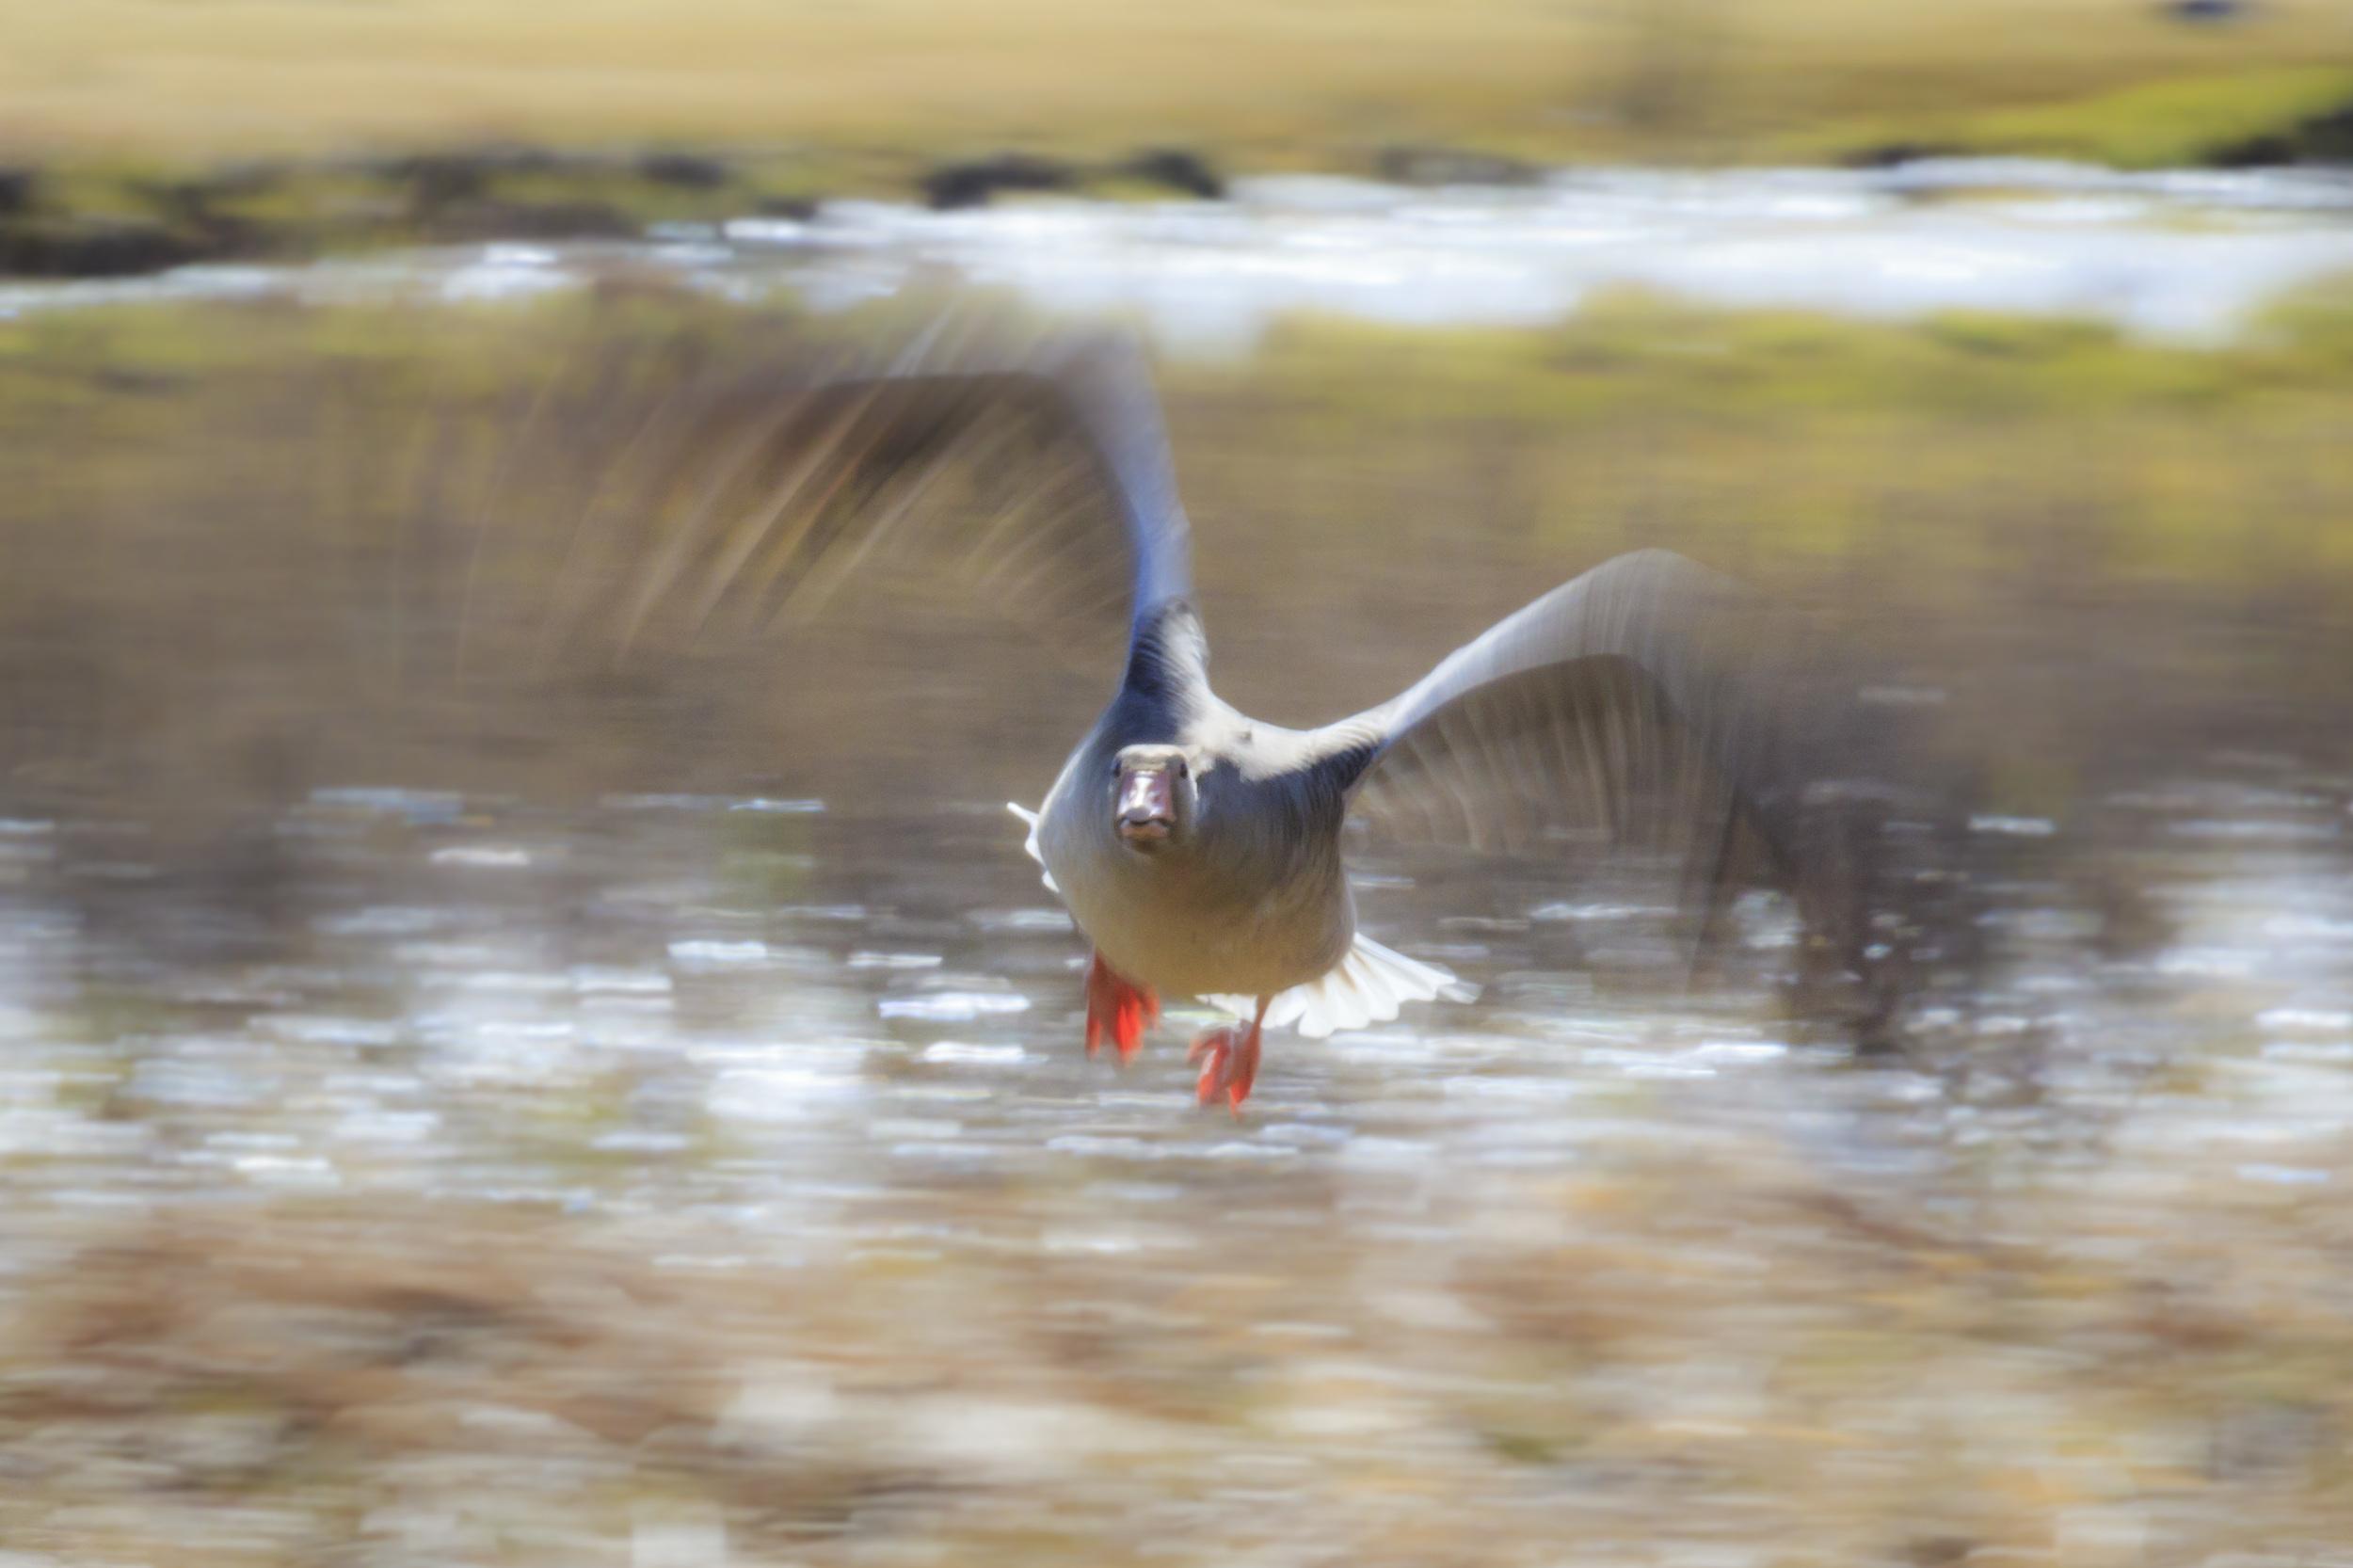 A speedy goose.